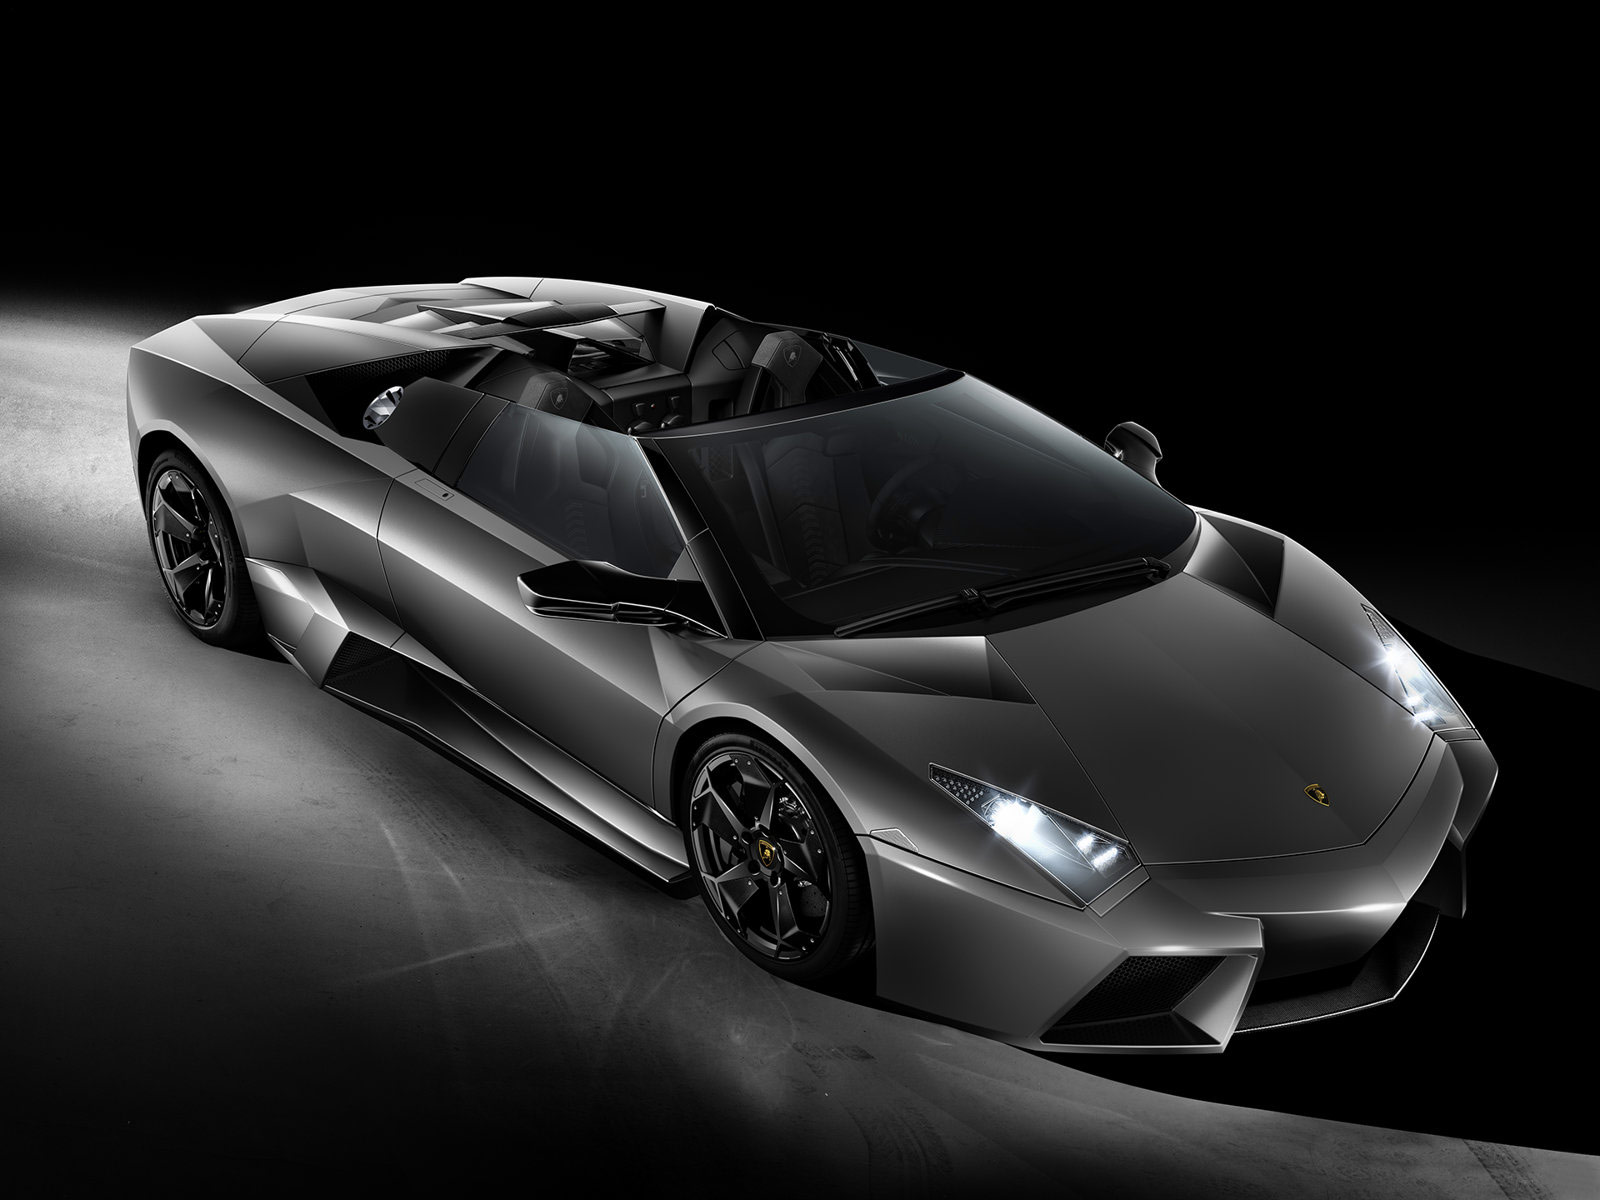 http://1.bp.blogspot.com/_m_XWwB73yT4/S-t7GAYbbKI/AAAAAAAABvw/x4Q4NWrPO-8/s1600/Lamborghini_Reventon_Roadster_2010_01.jpg